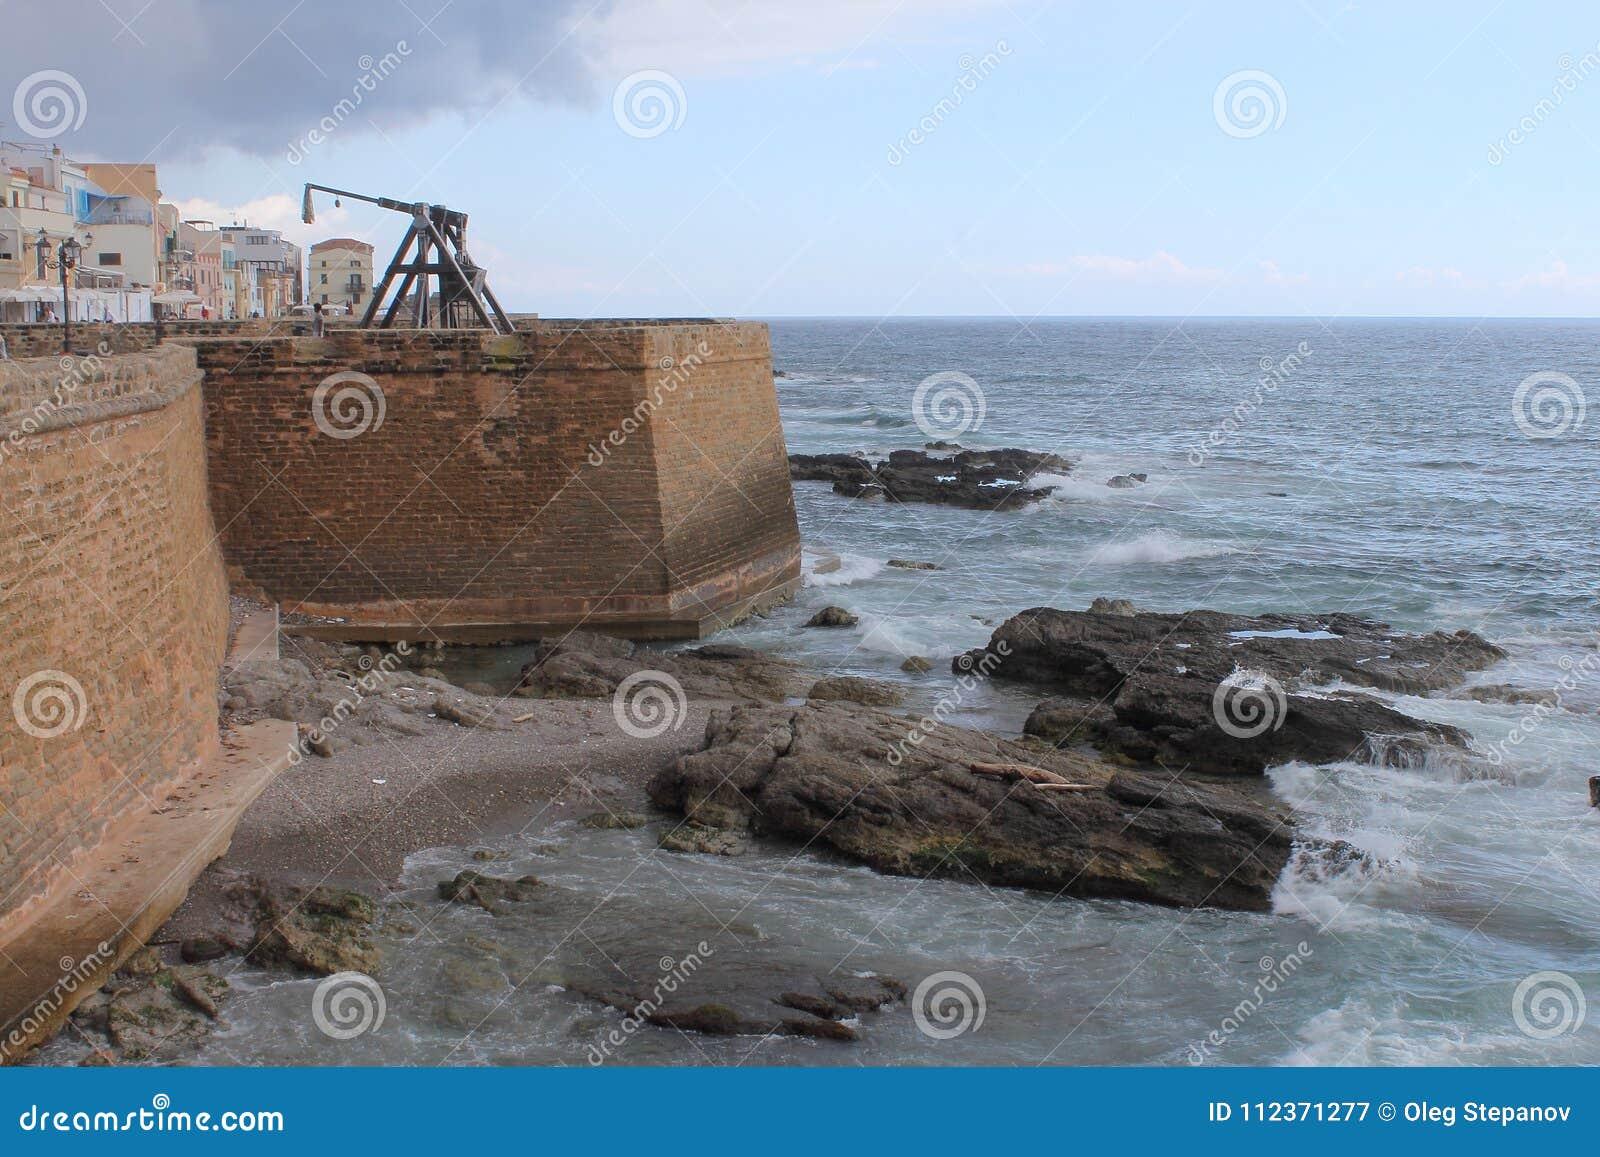 Catapult, Bastione and Crown city walls of Alghero Italy Sardinia